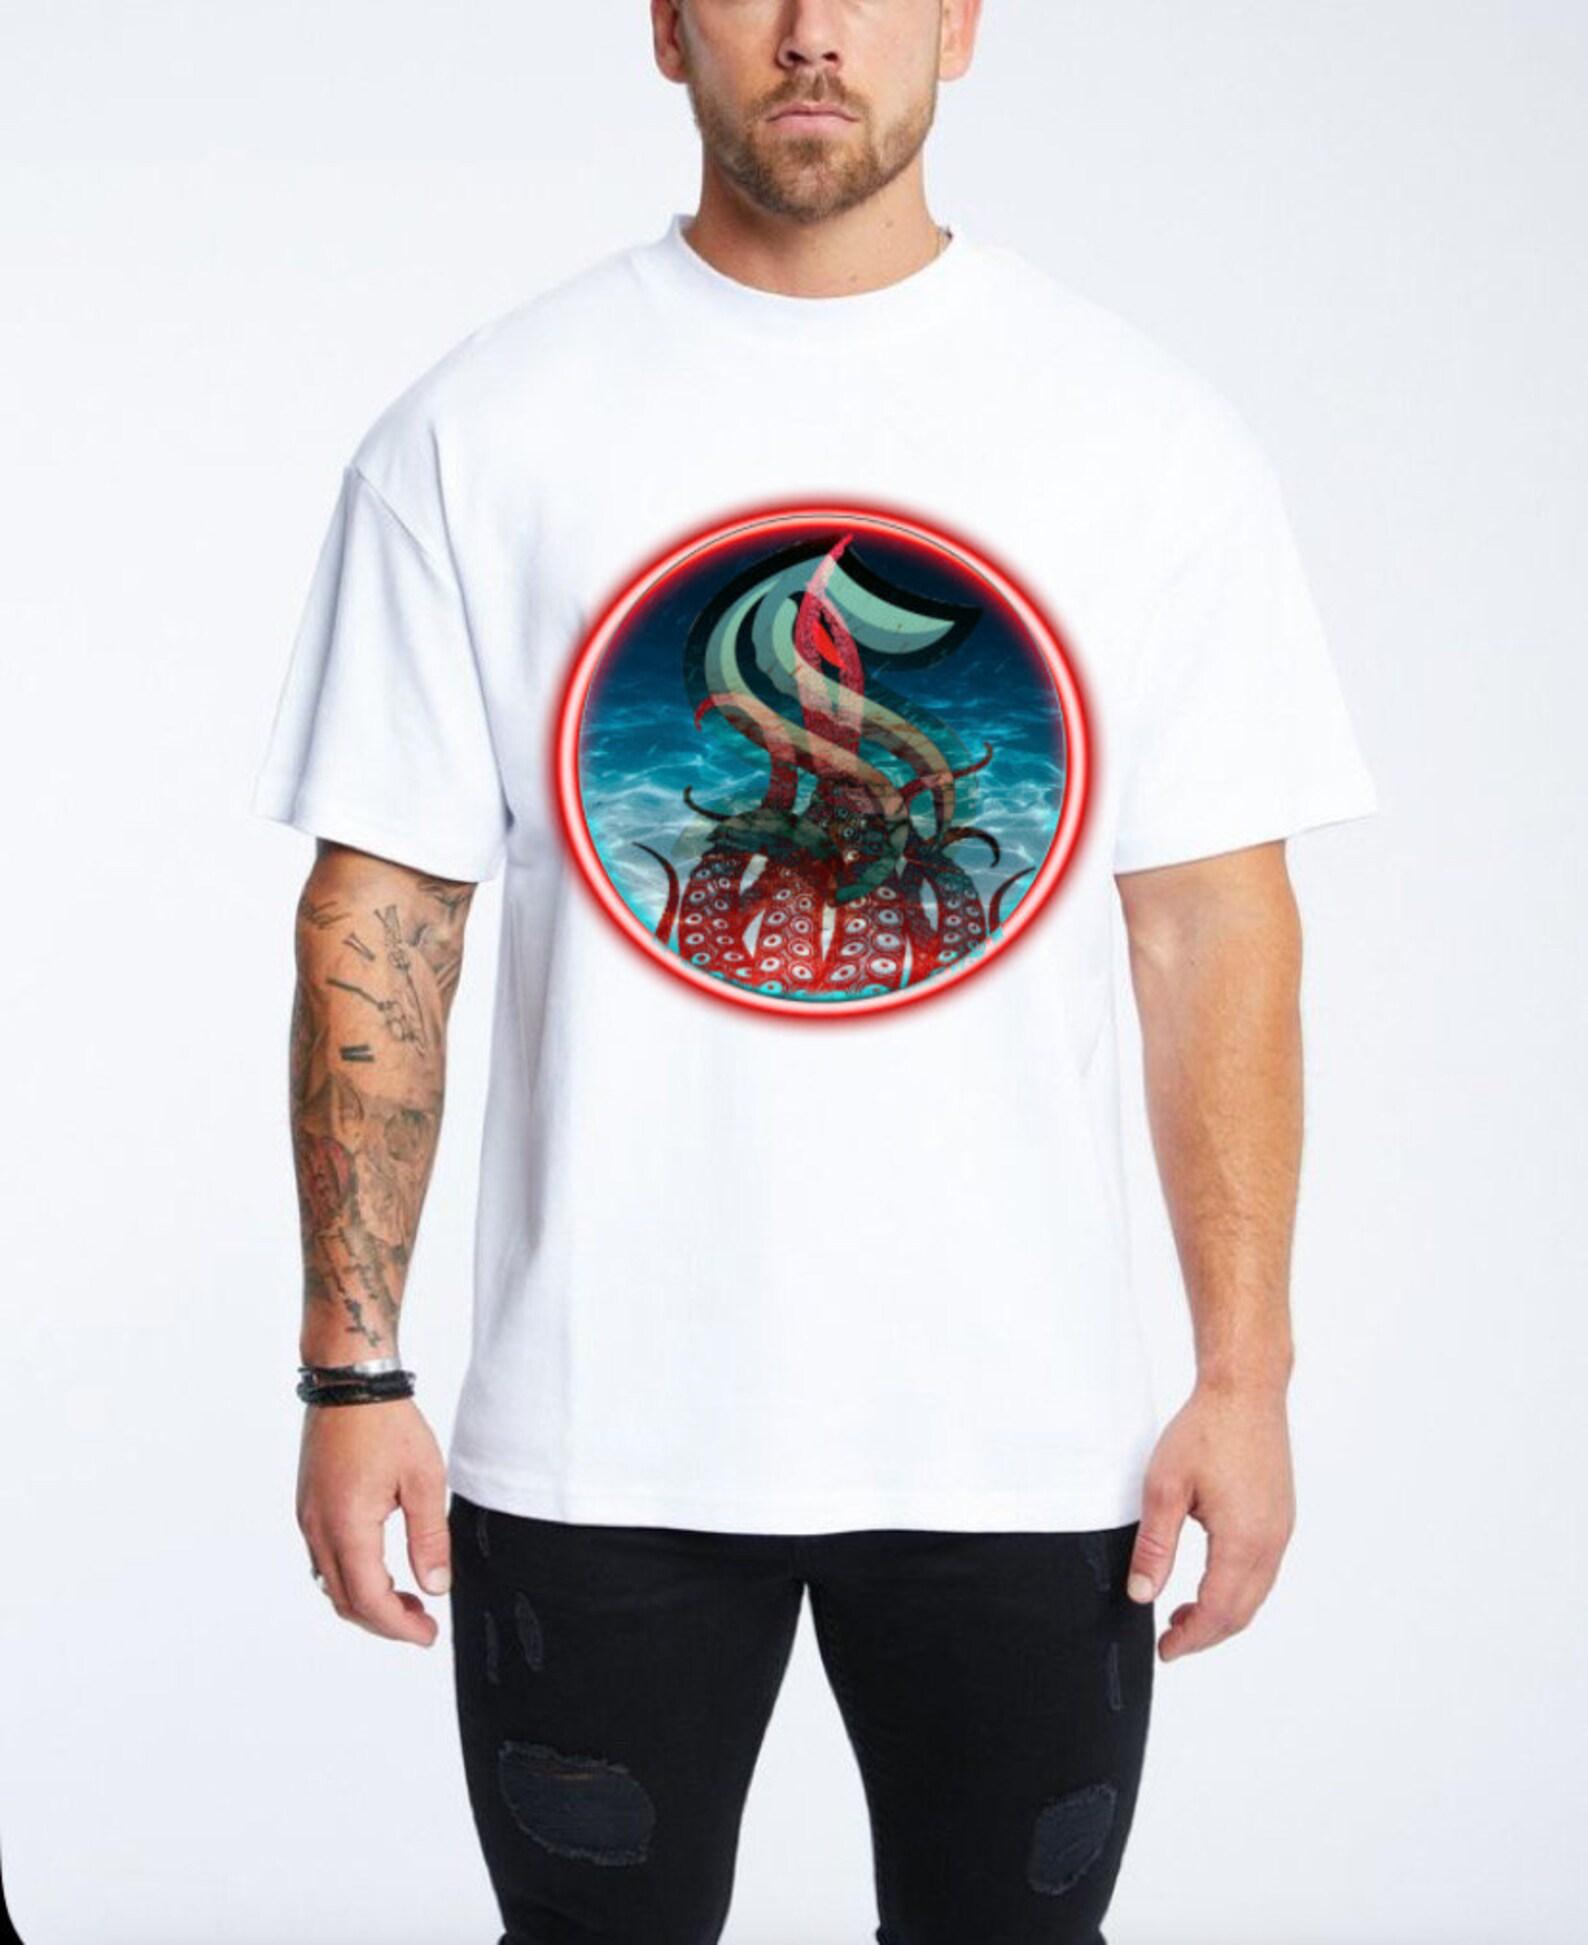 seattle kraken seattle kraken png hockey nhl logo team